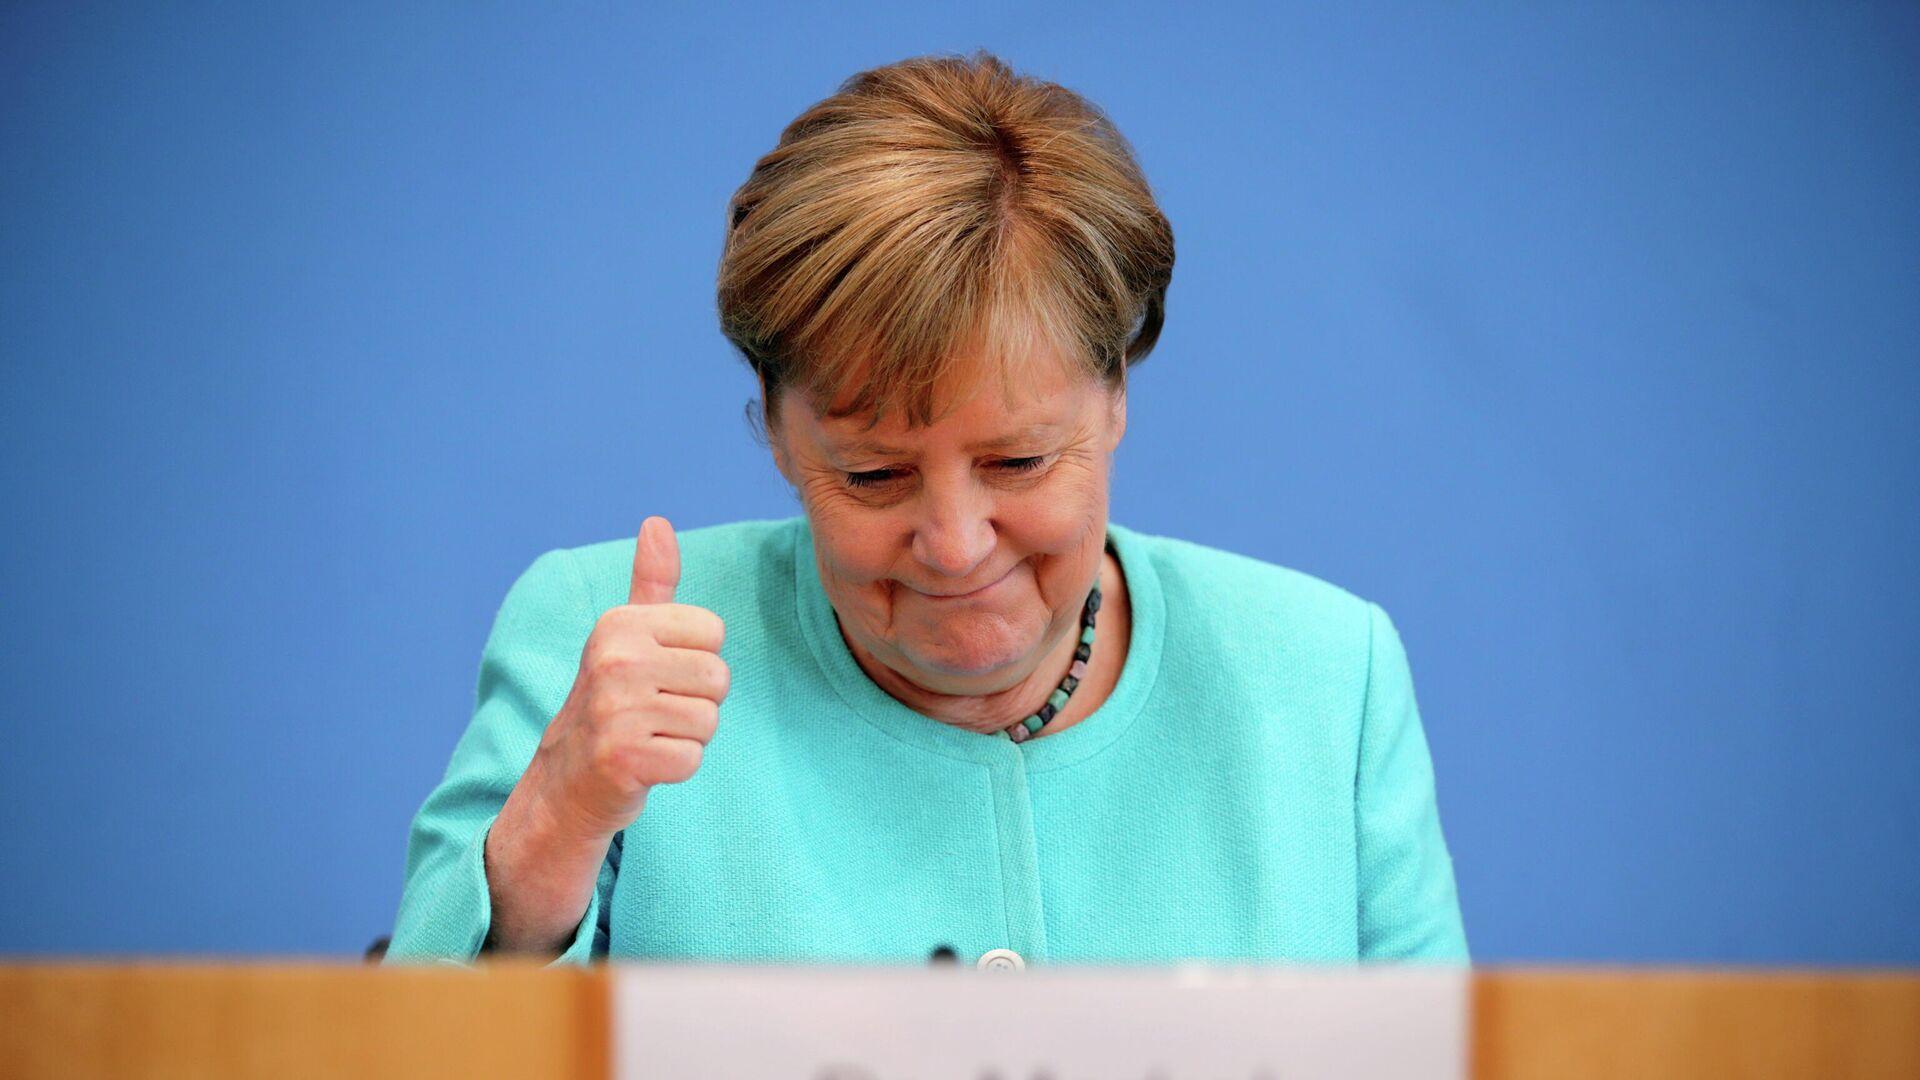 Angela Merkel, canciller alemana - Sputnik Mundo, 1920, 22.07.2021